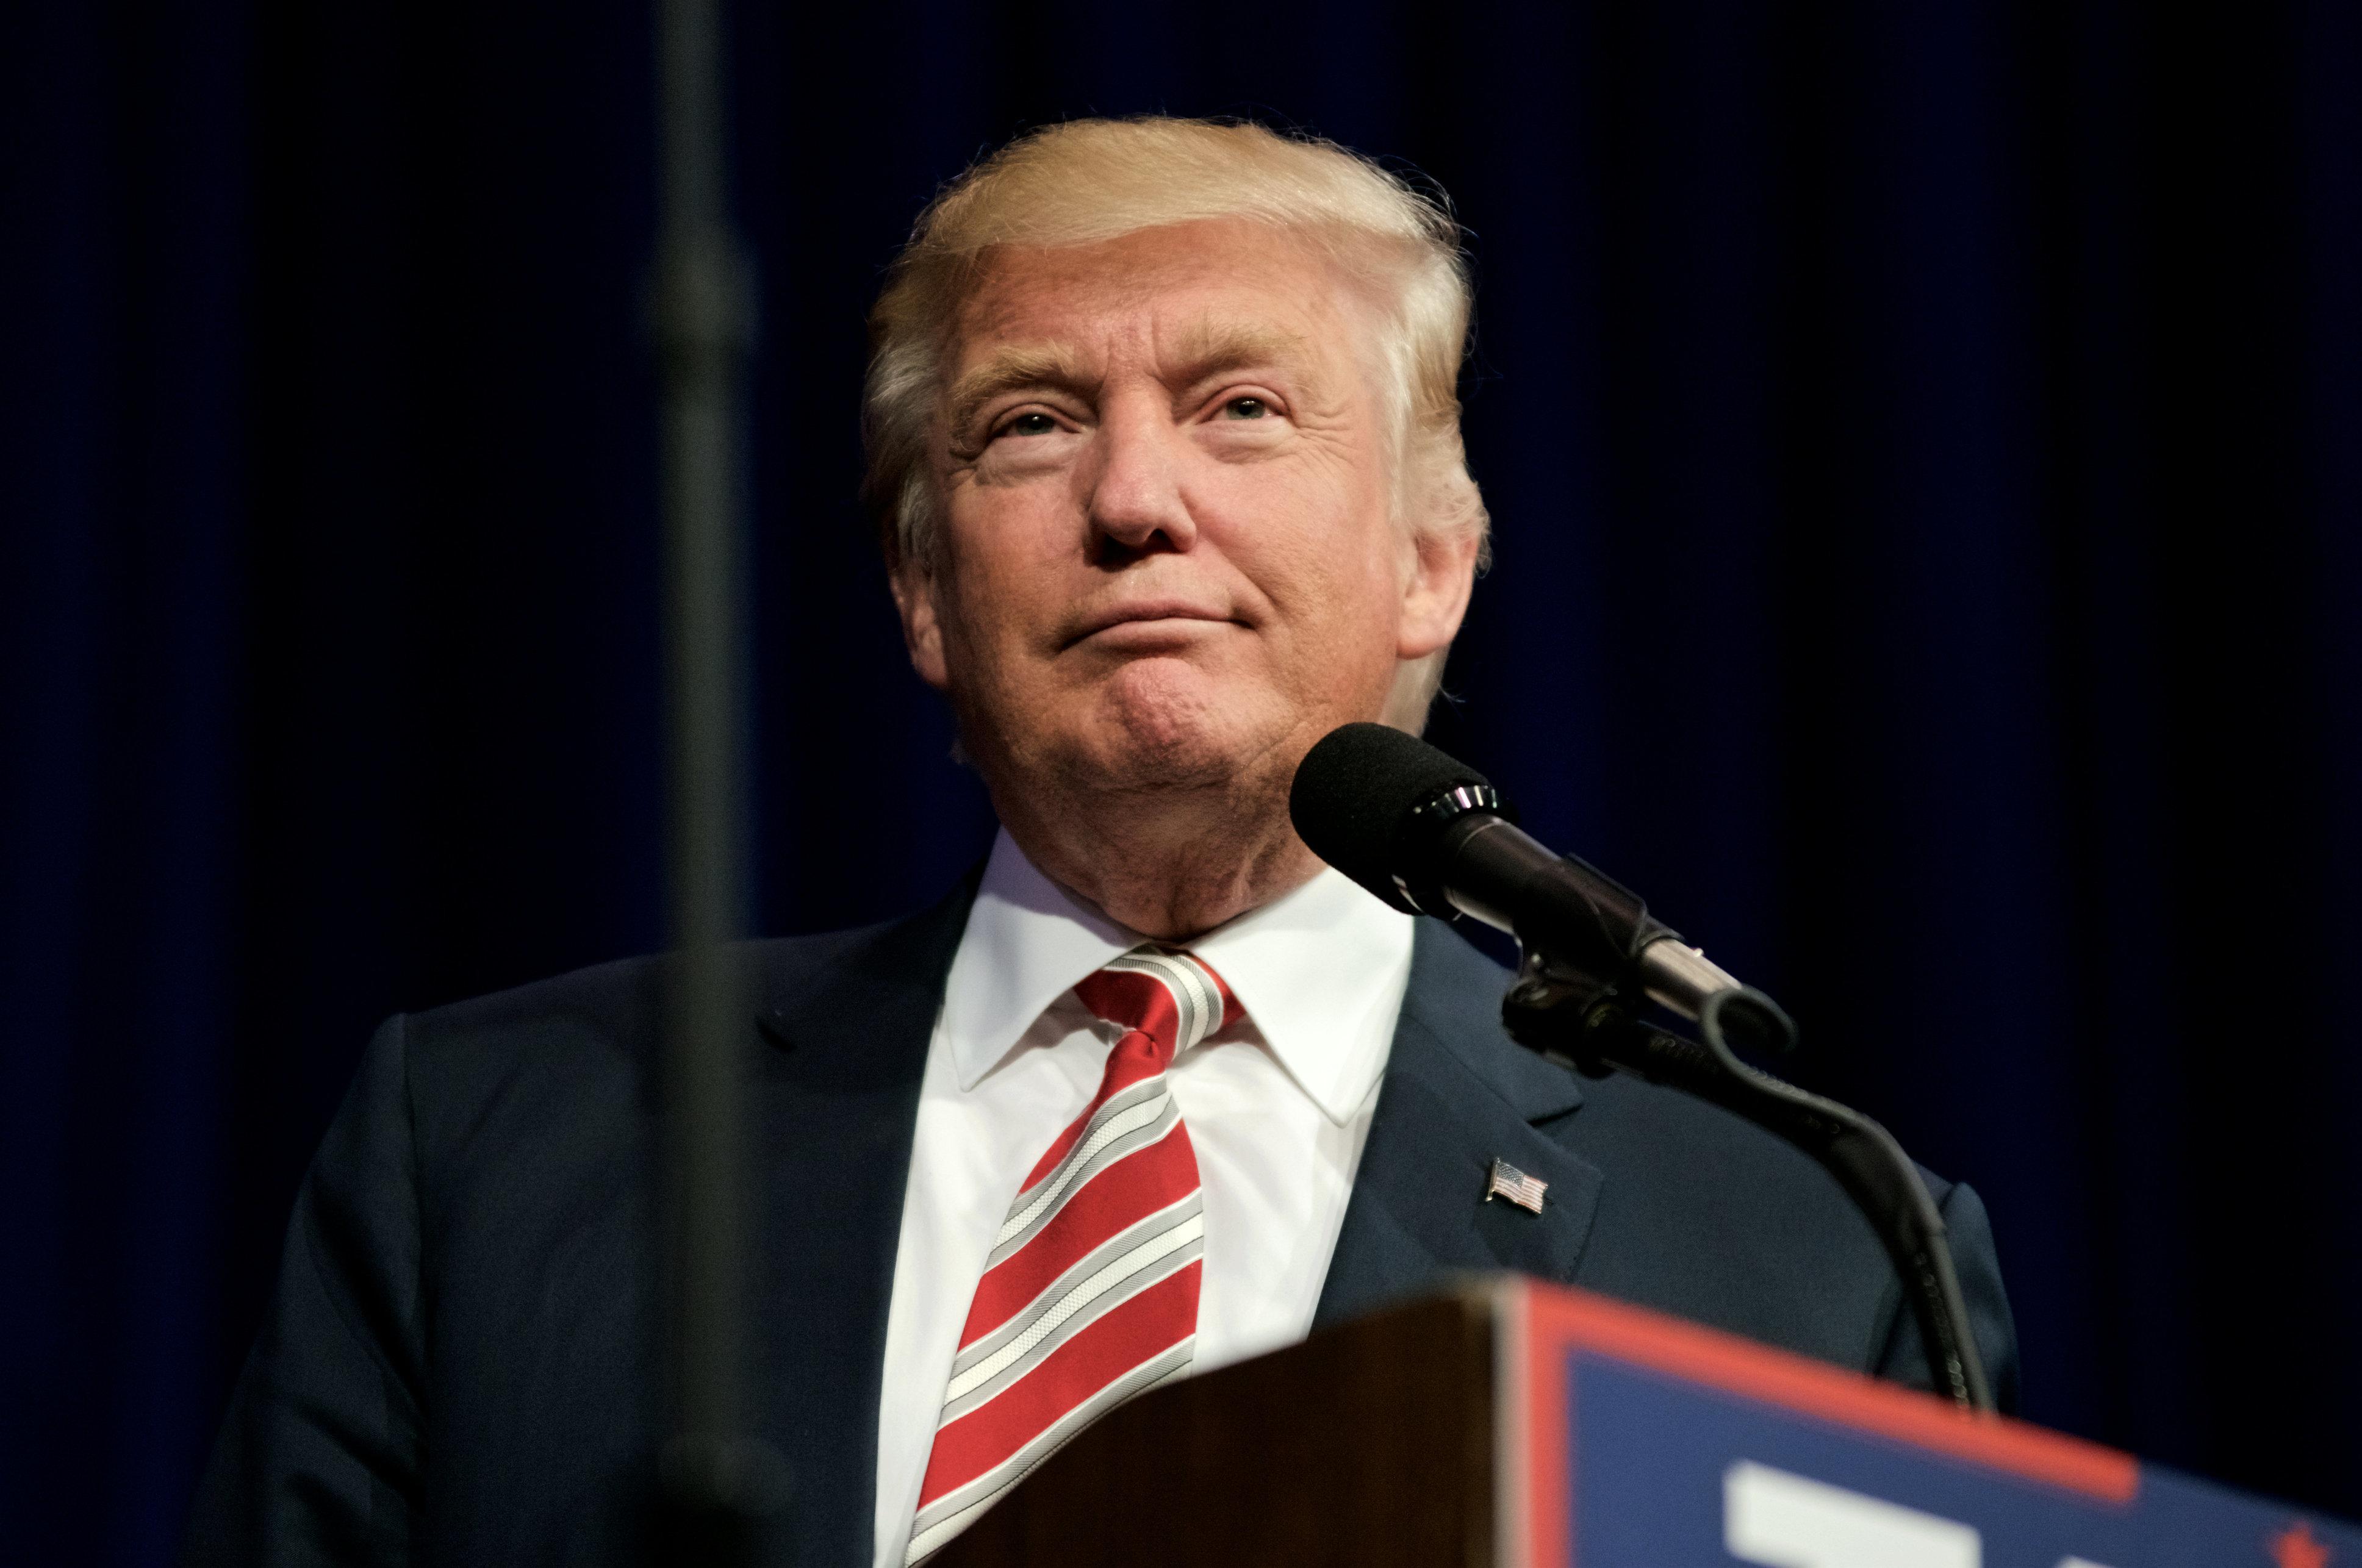 Aston, PA, USA - September 22, 2016: Republican presidential nominee Donald Trump delivers a speech at a rally in Aston, Pennsylvania.